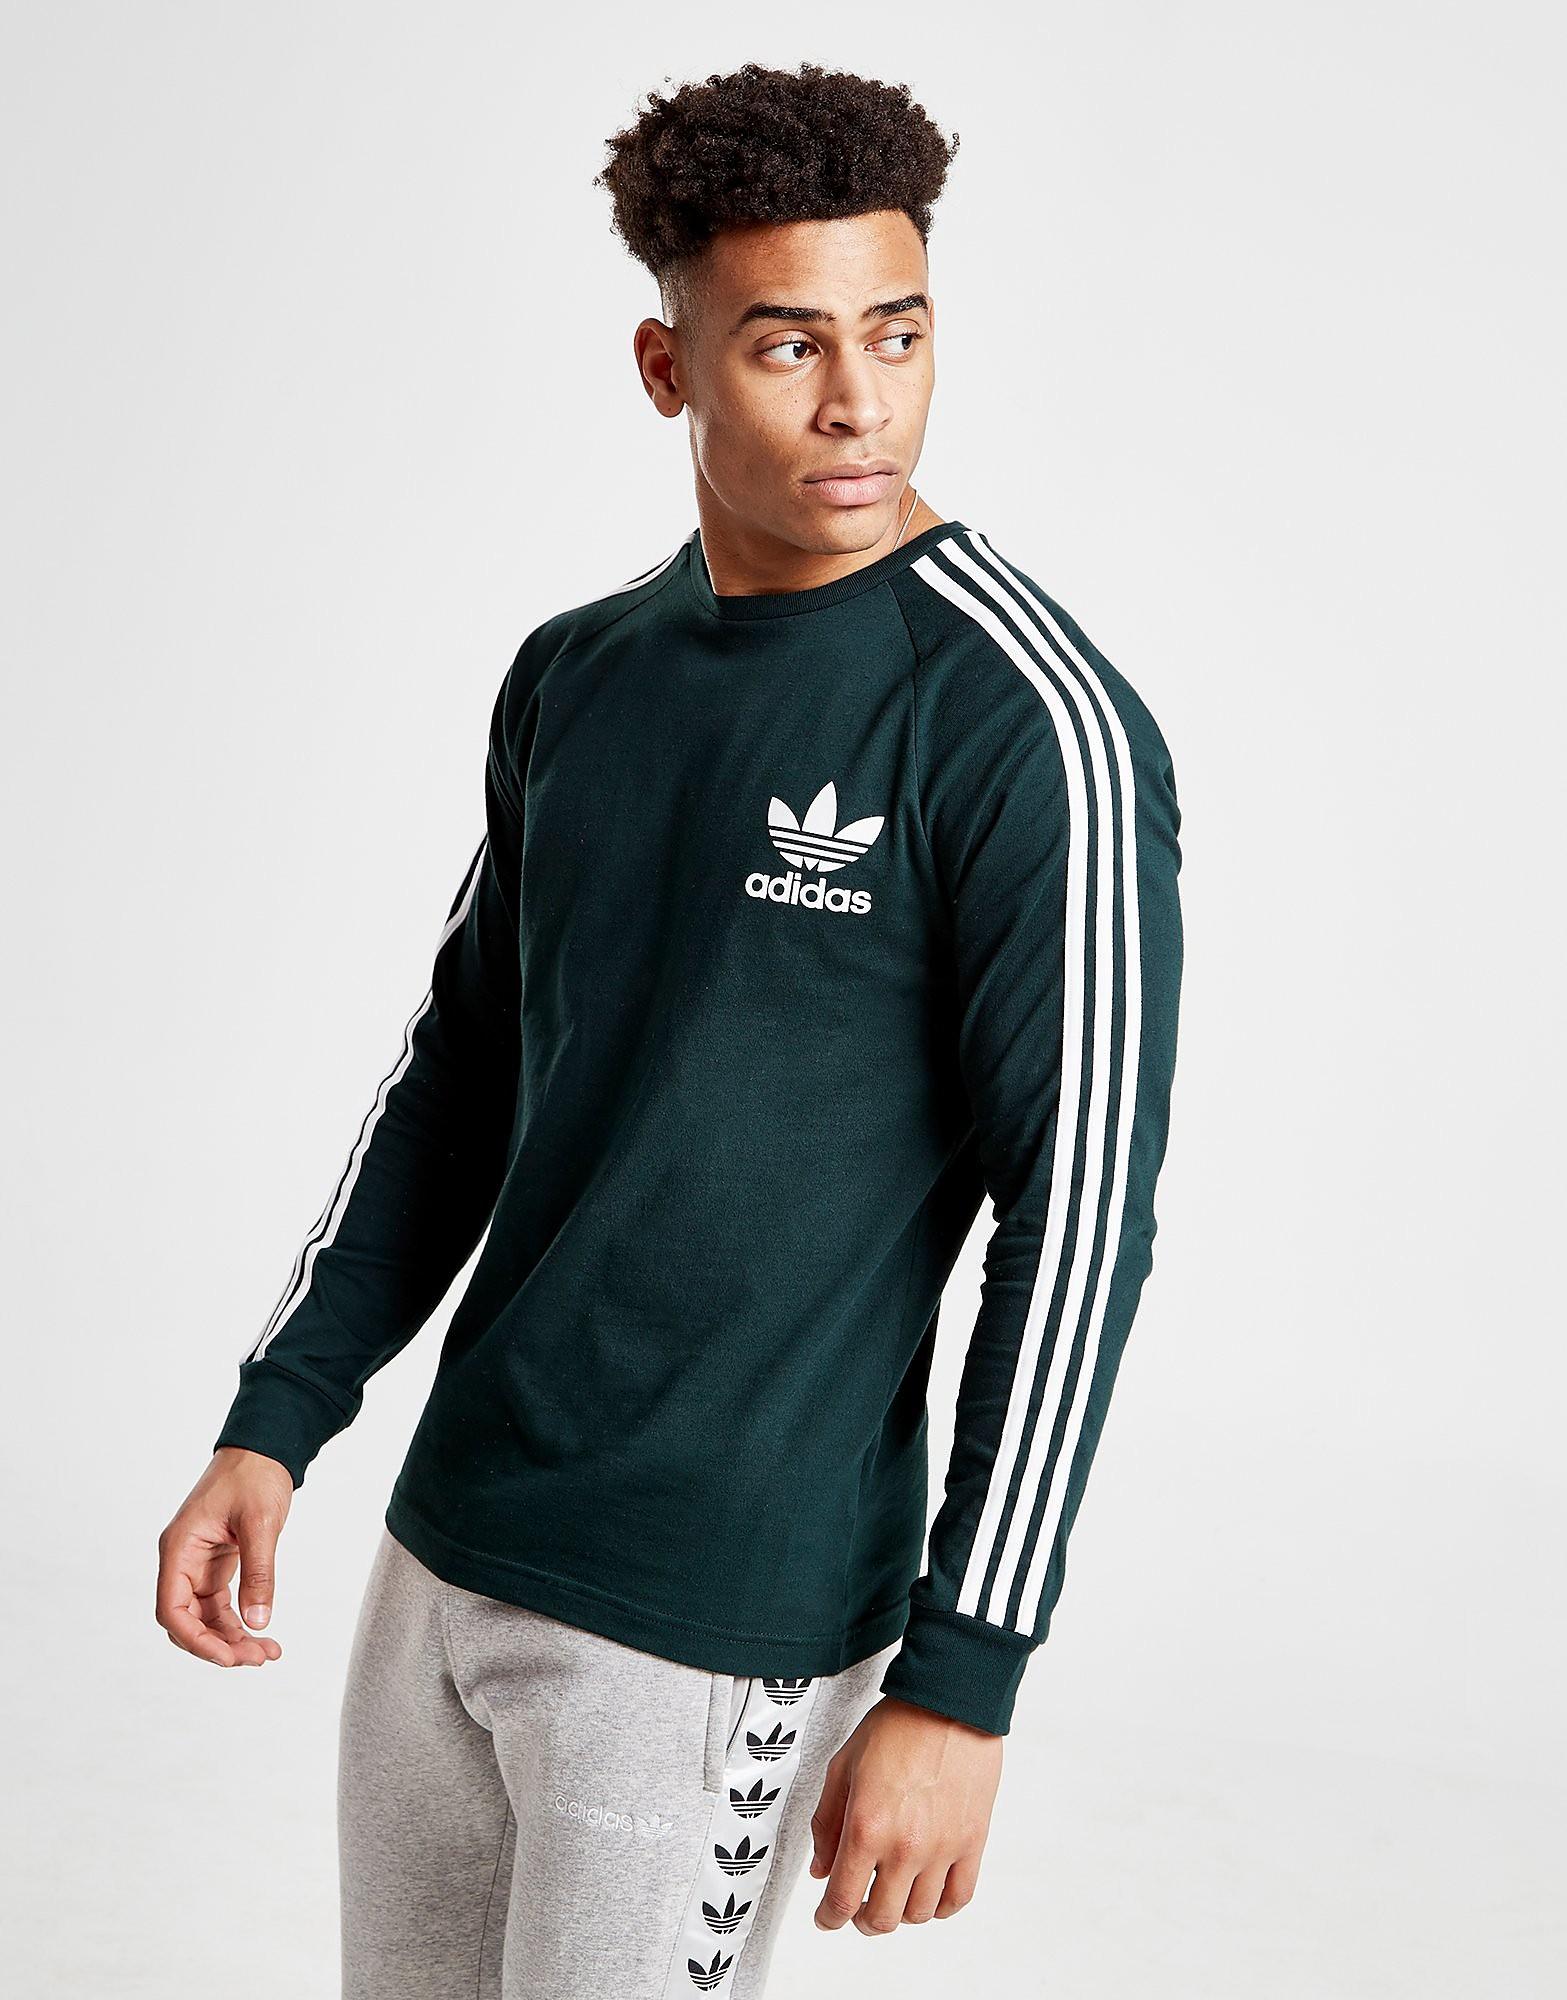 adidas Originals California Long Sleeve T-Shirt - alleen bij JD - Groen - Heren